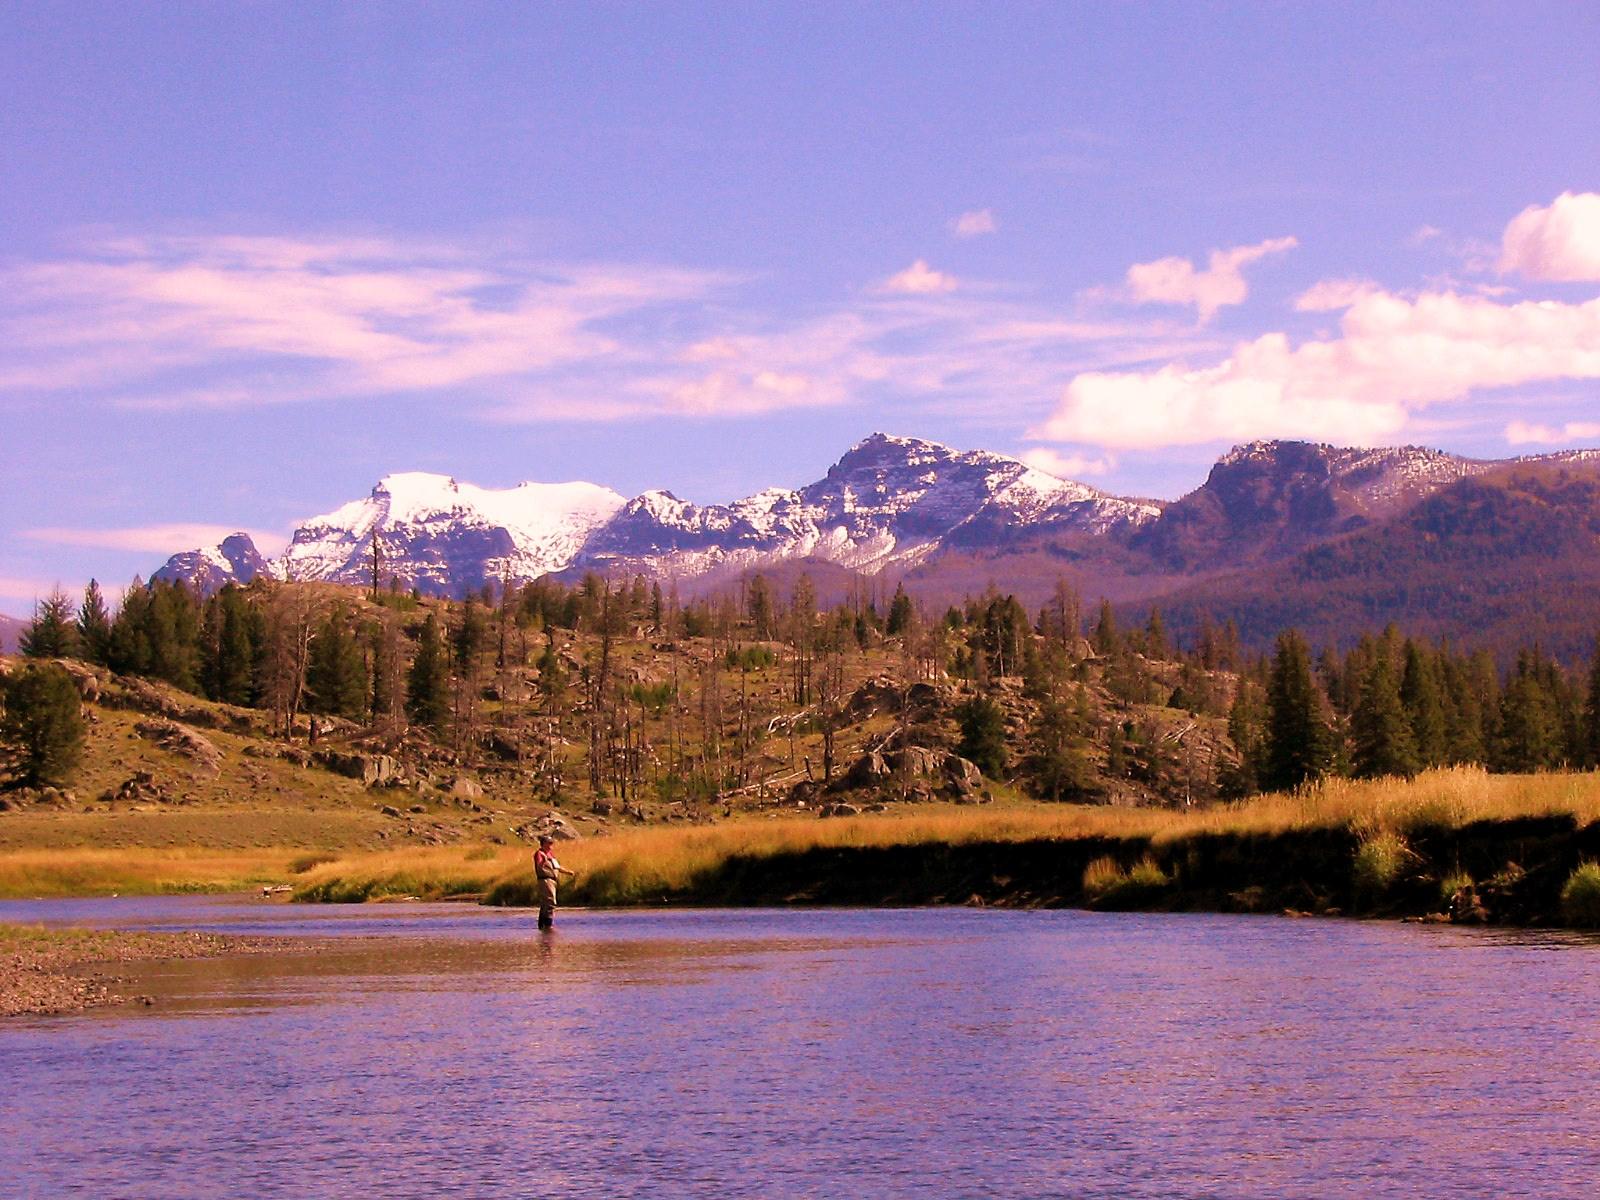 James fishing in Montana